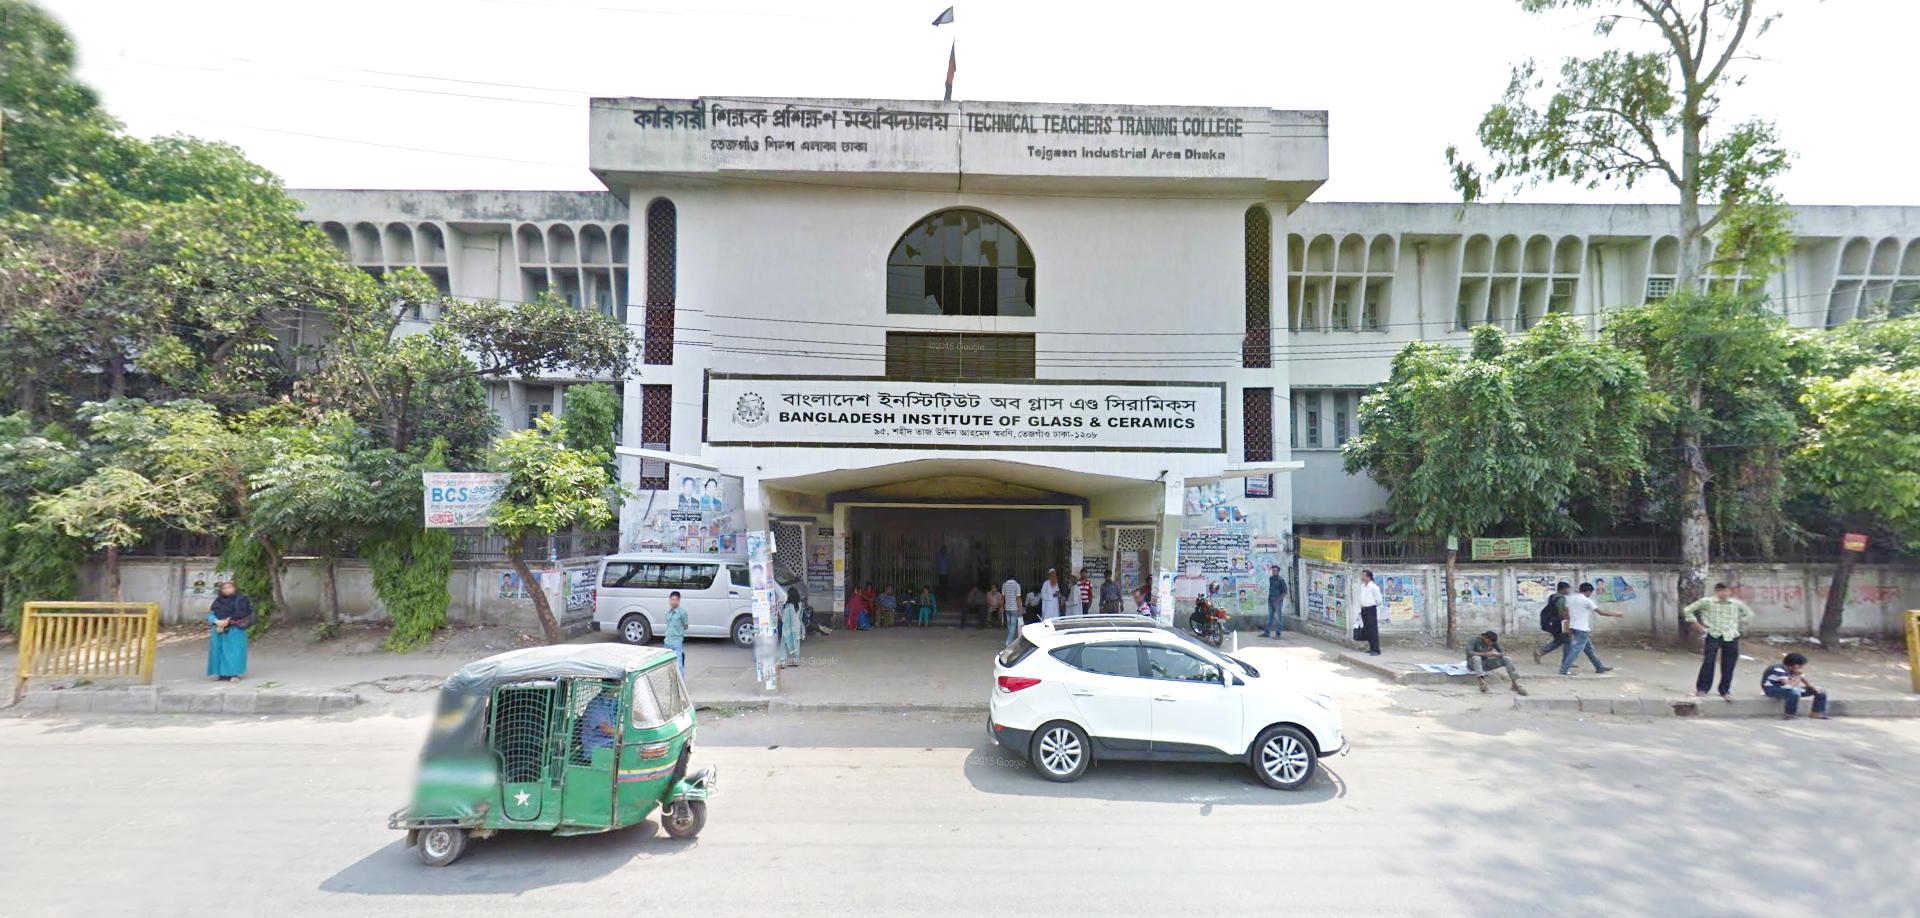 Bangladesh Institute of Glass and Ceramics